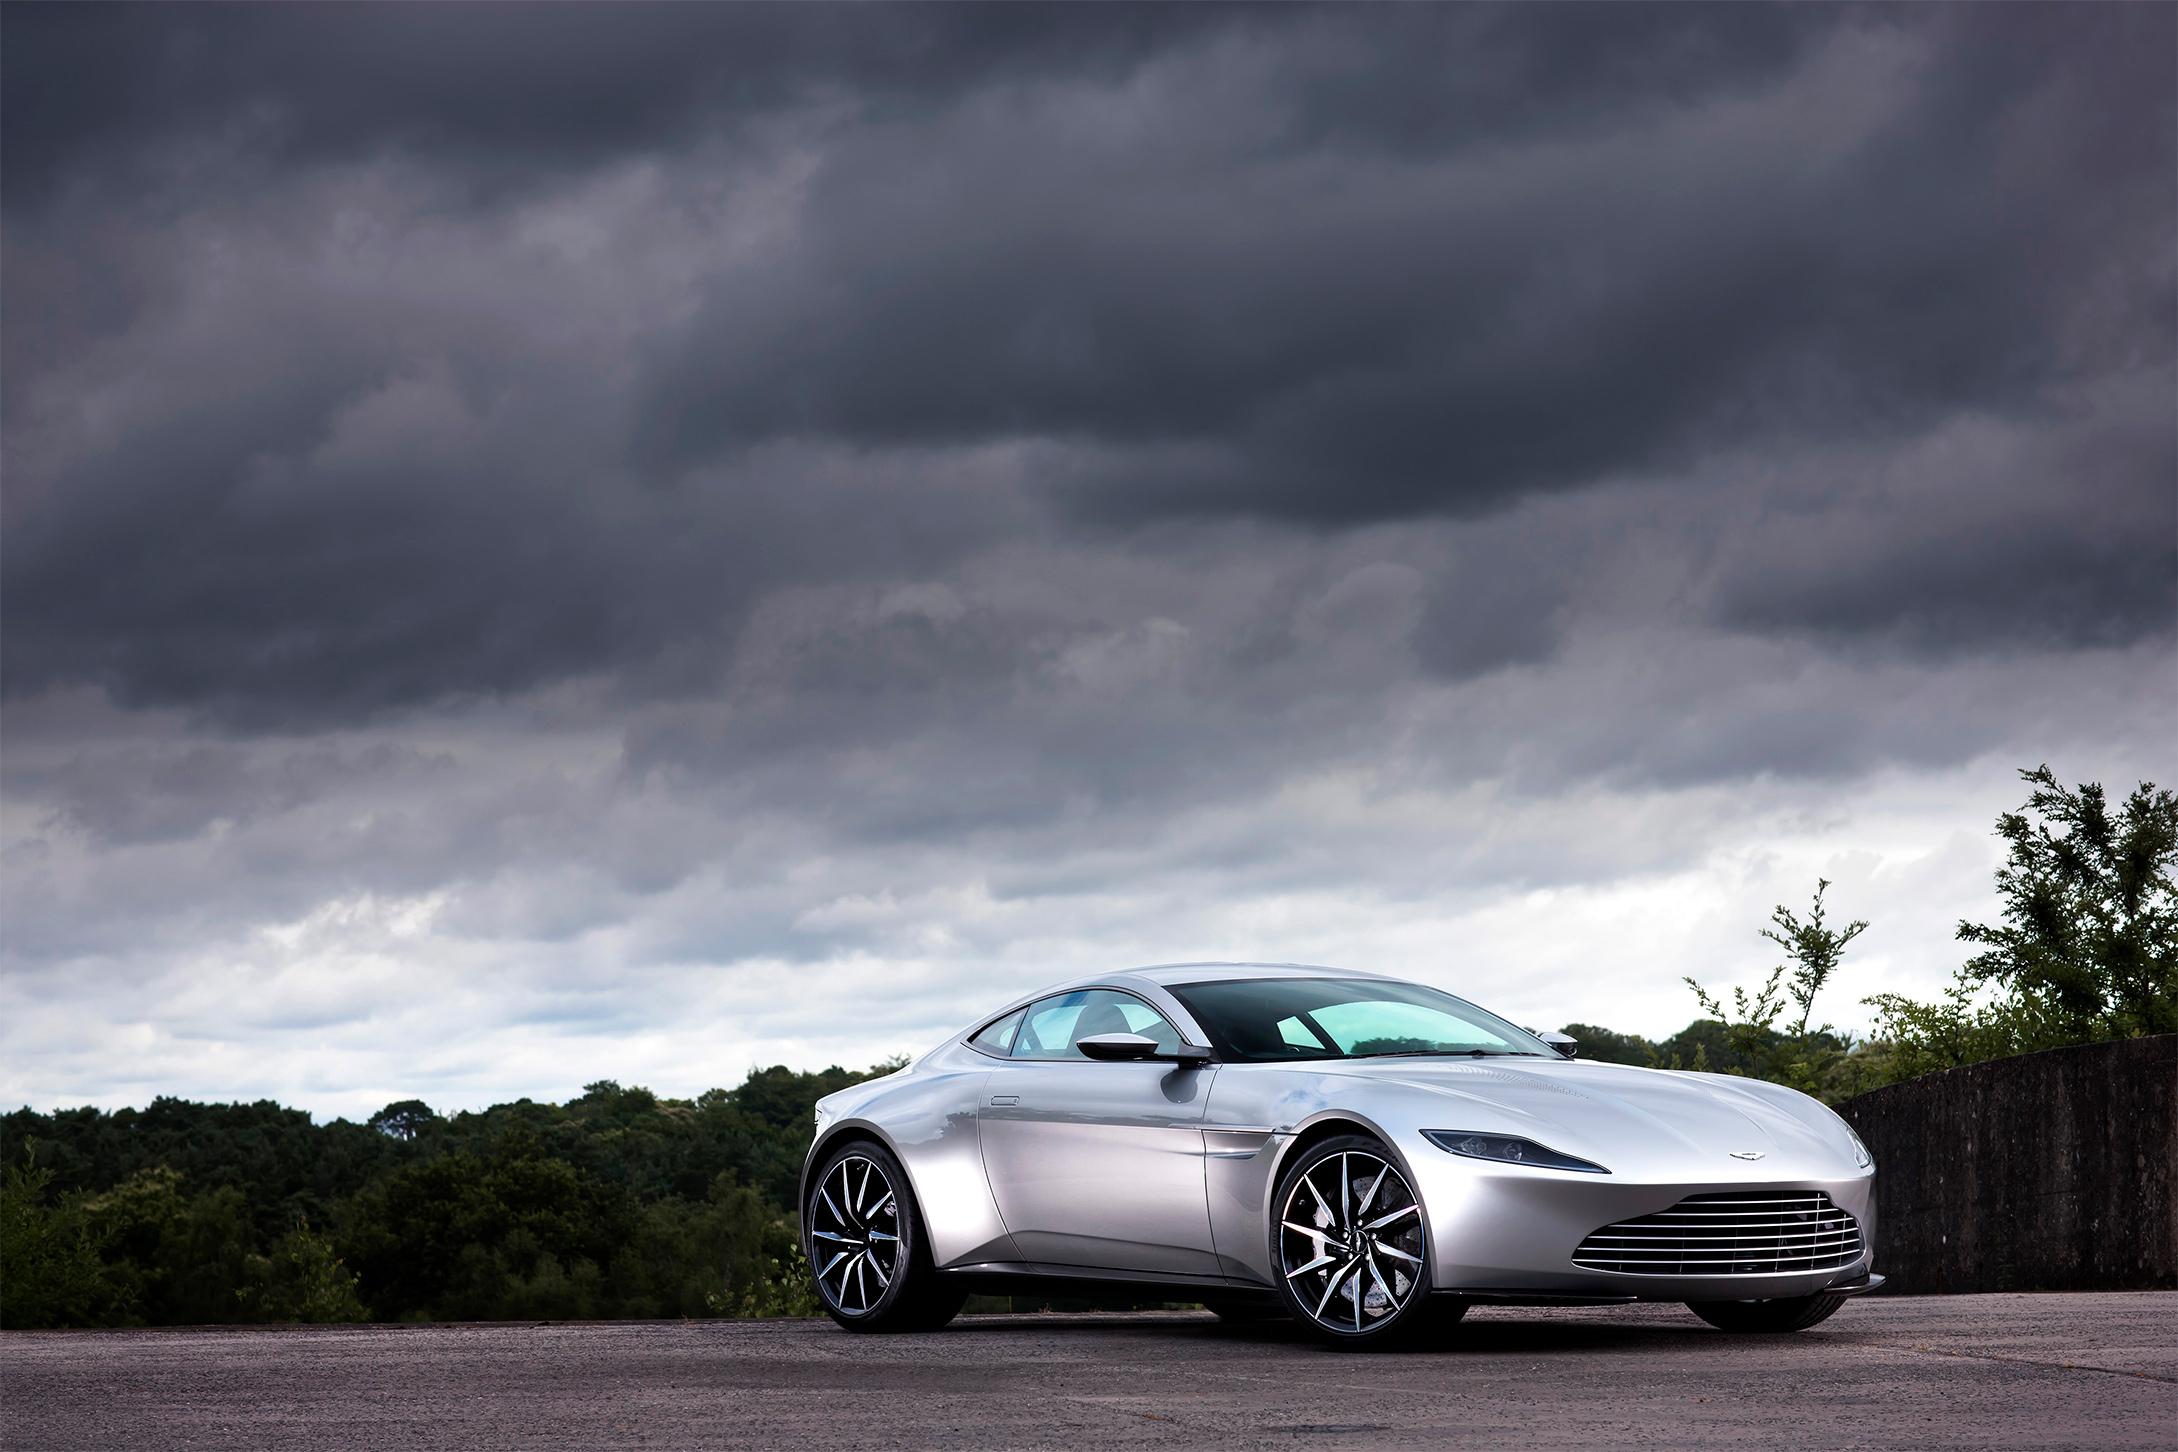 TrackWorthy - Aston Martin DB10